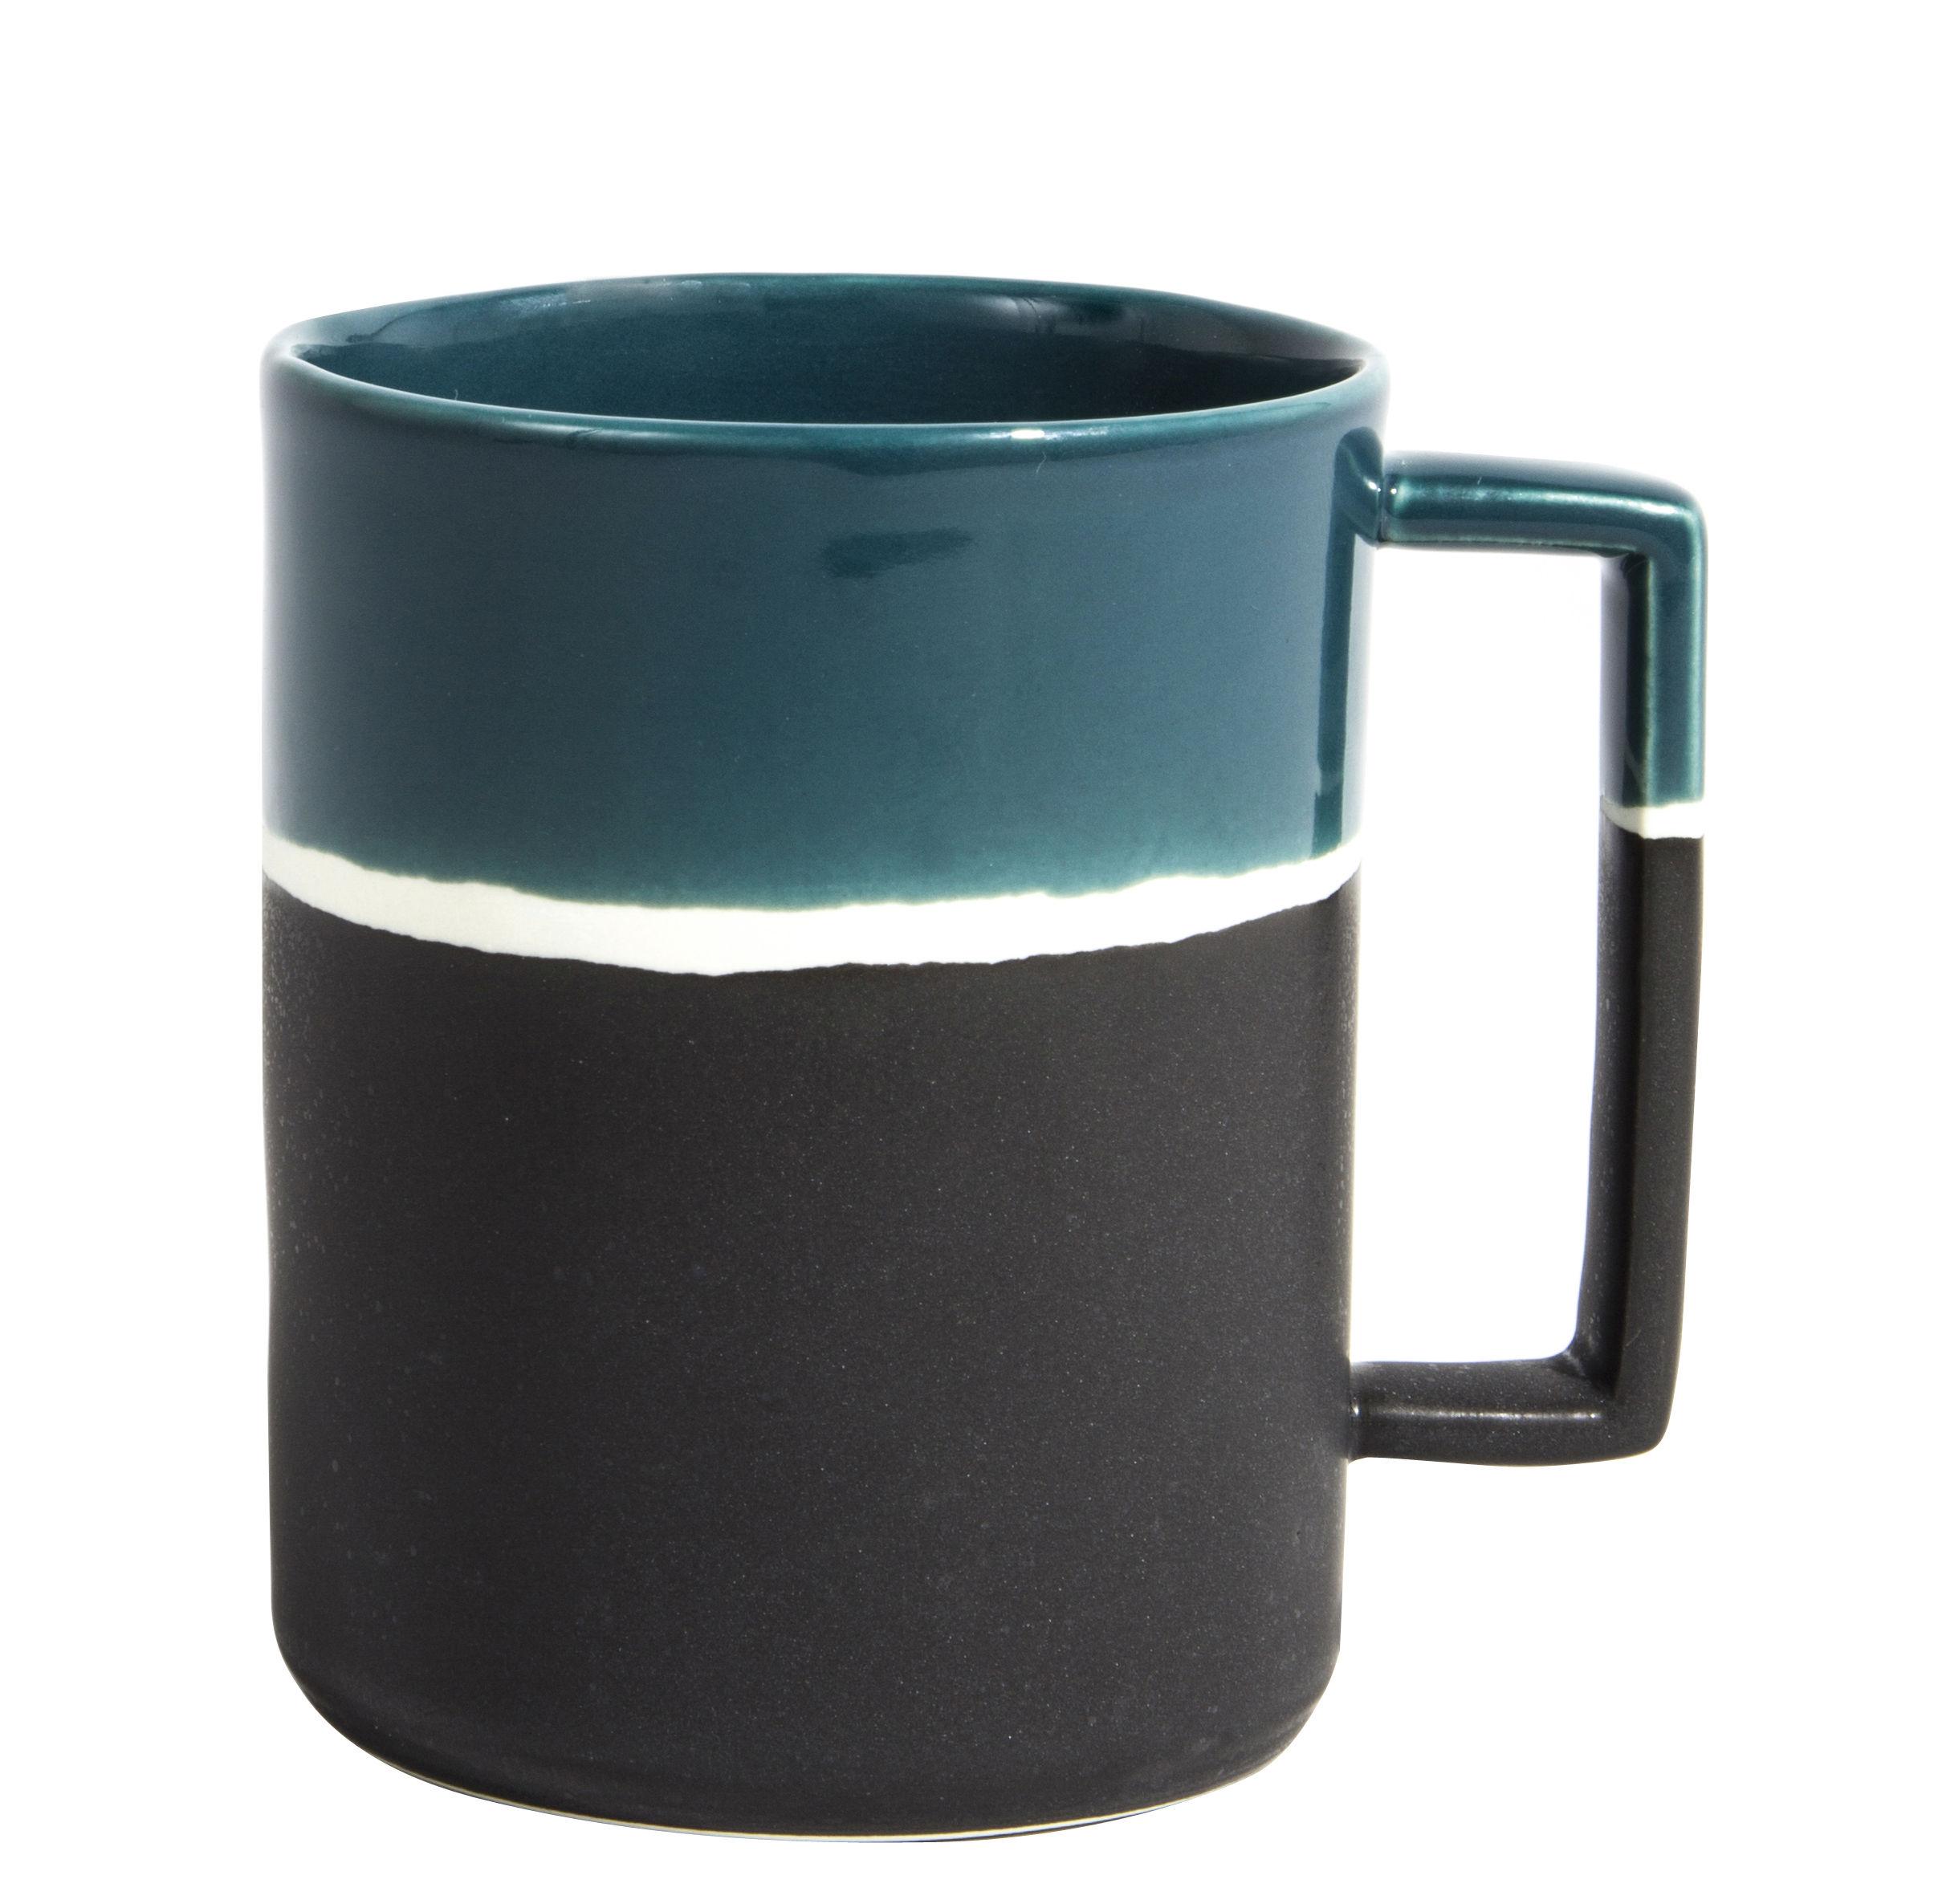 Tableware - Coffee Mugs & Tea Cups - Sicilia Mug by Maison Sarah Lavoine - Sarah blue - Painted enameled stoneware